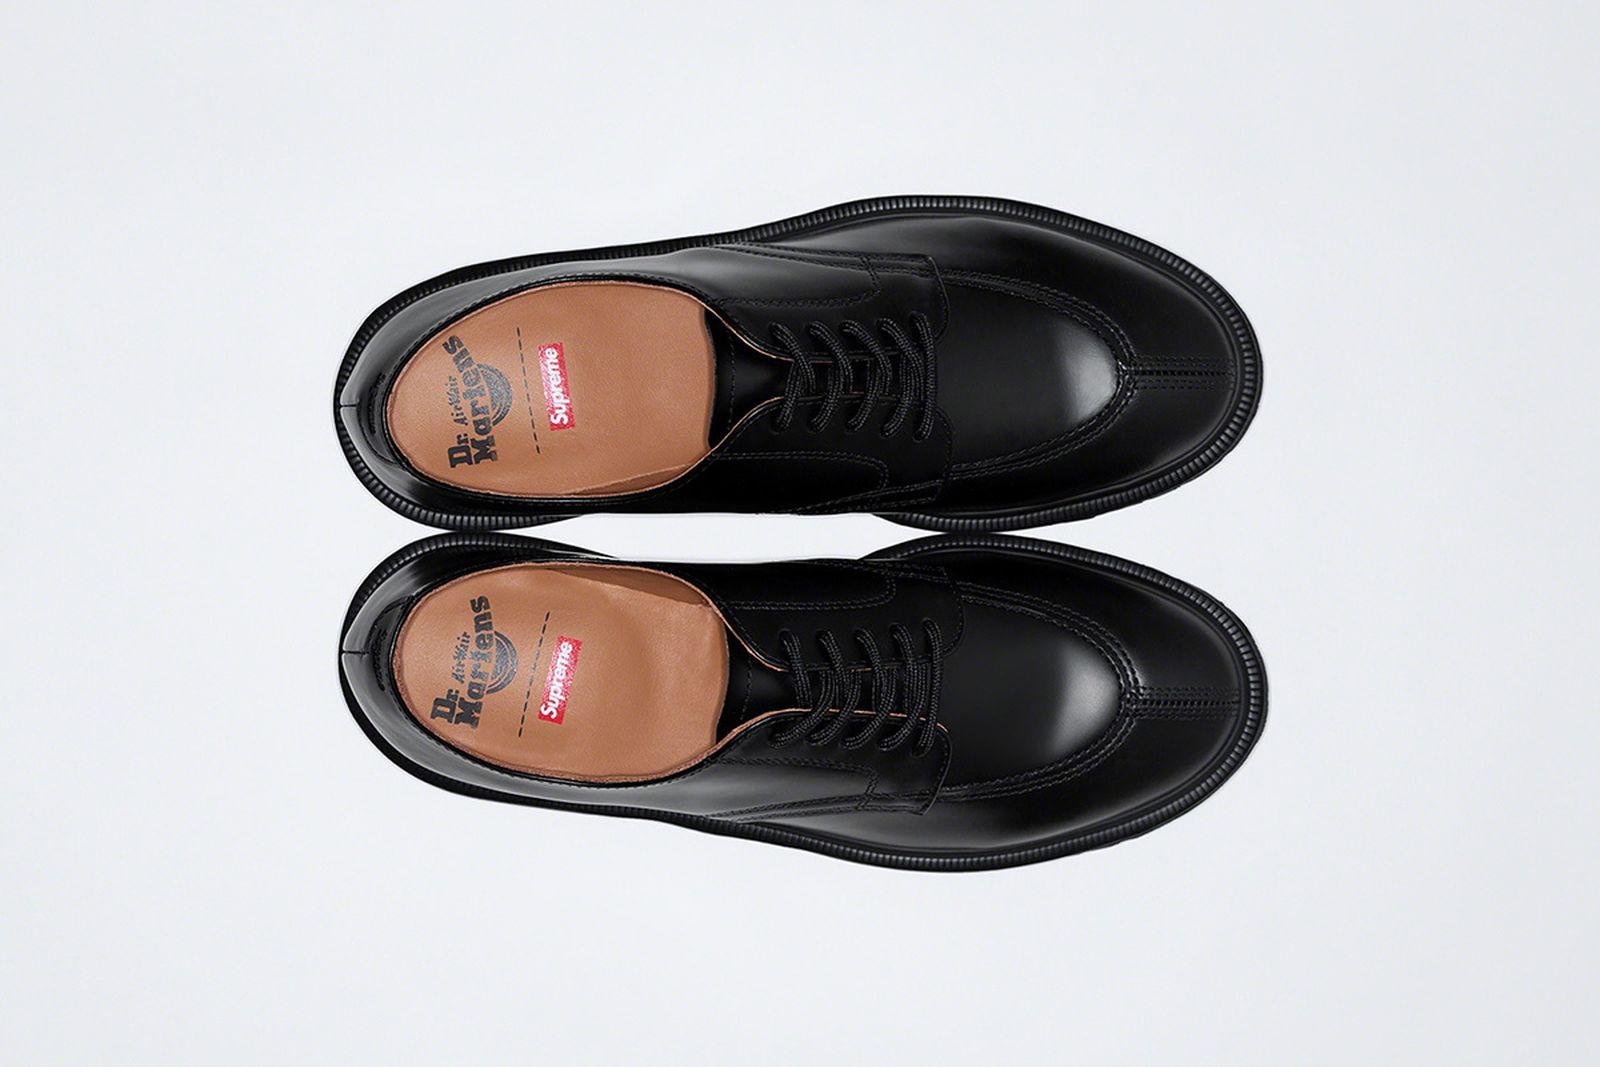 supreme-dr-martens-5-eye-shoe-release-date-price-10